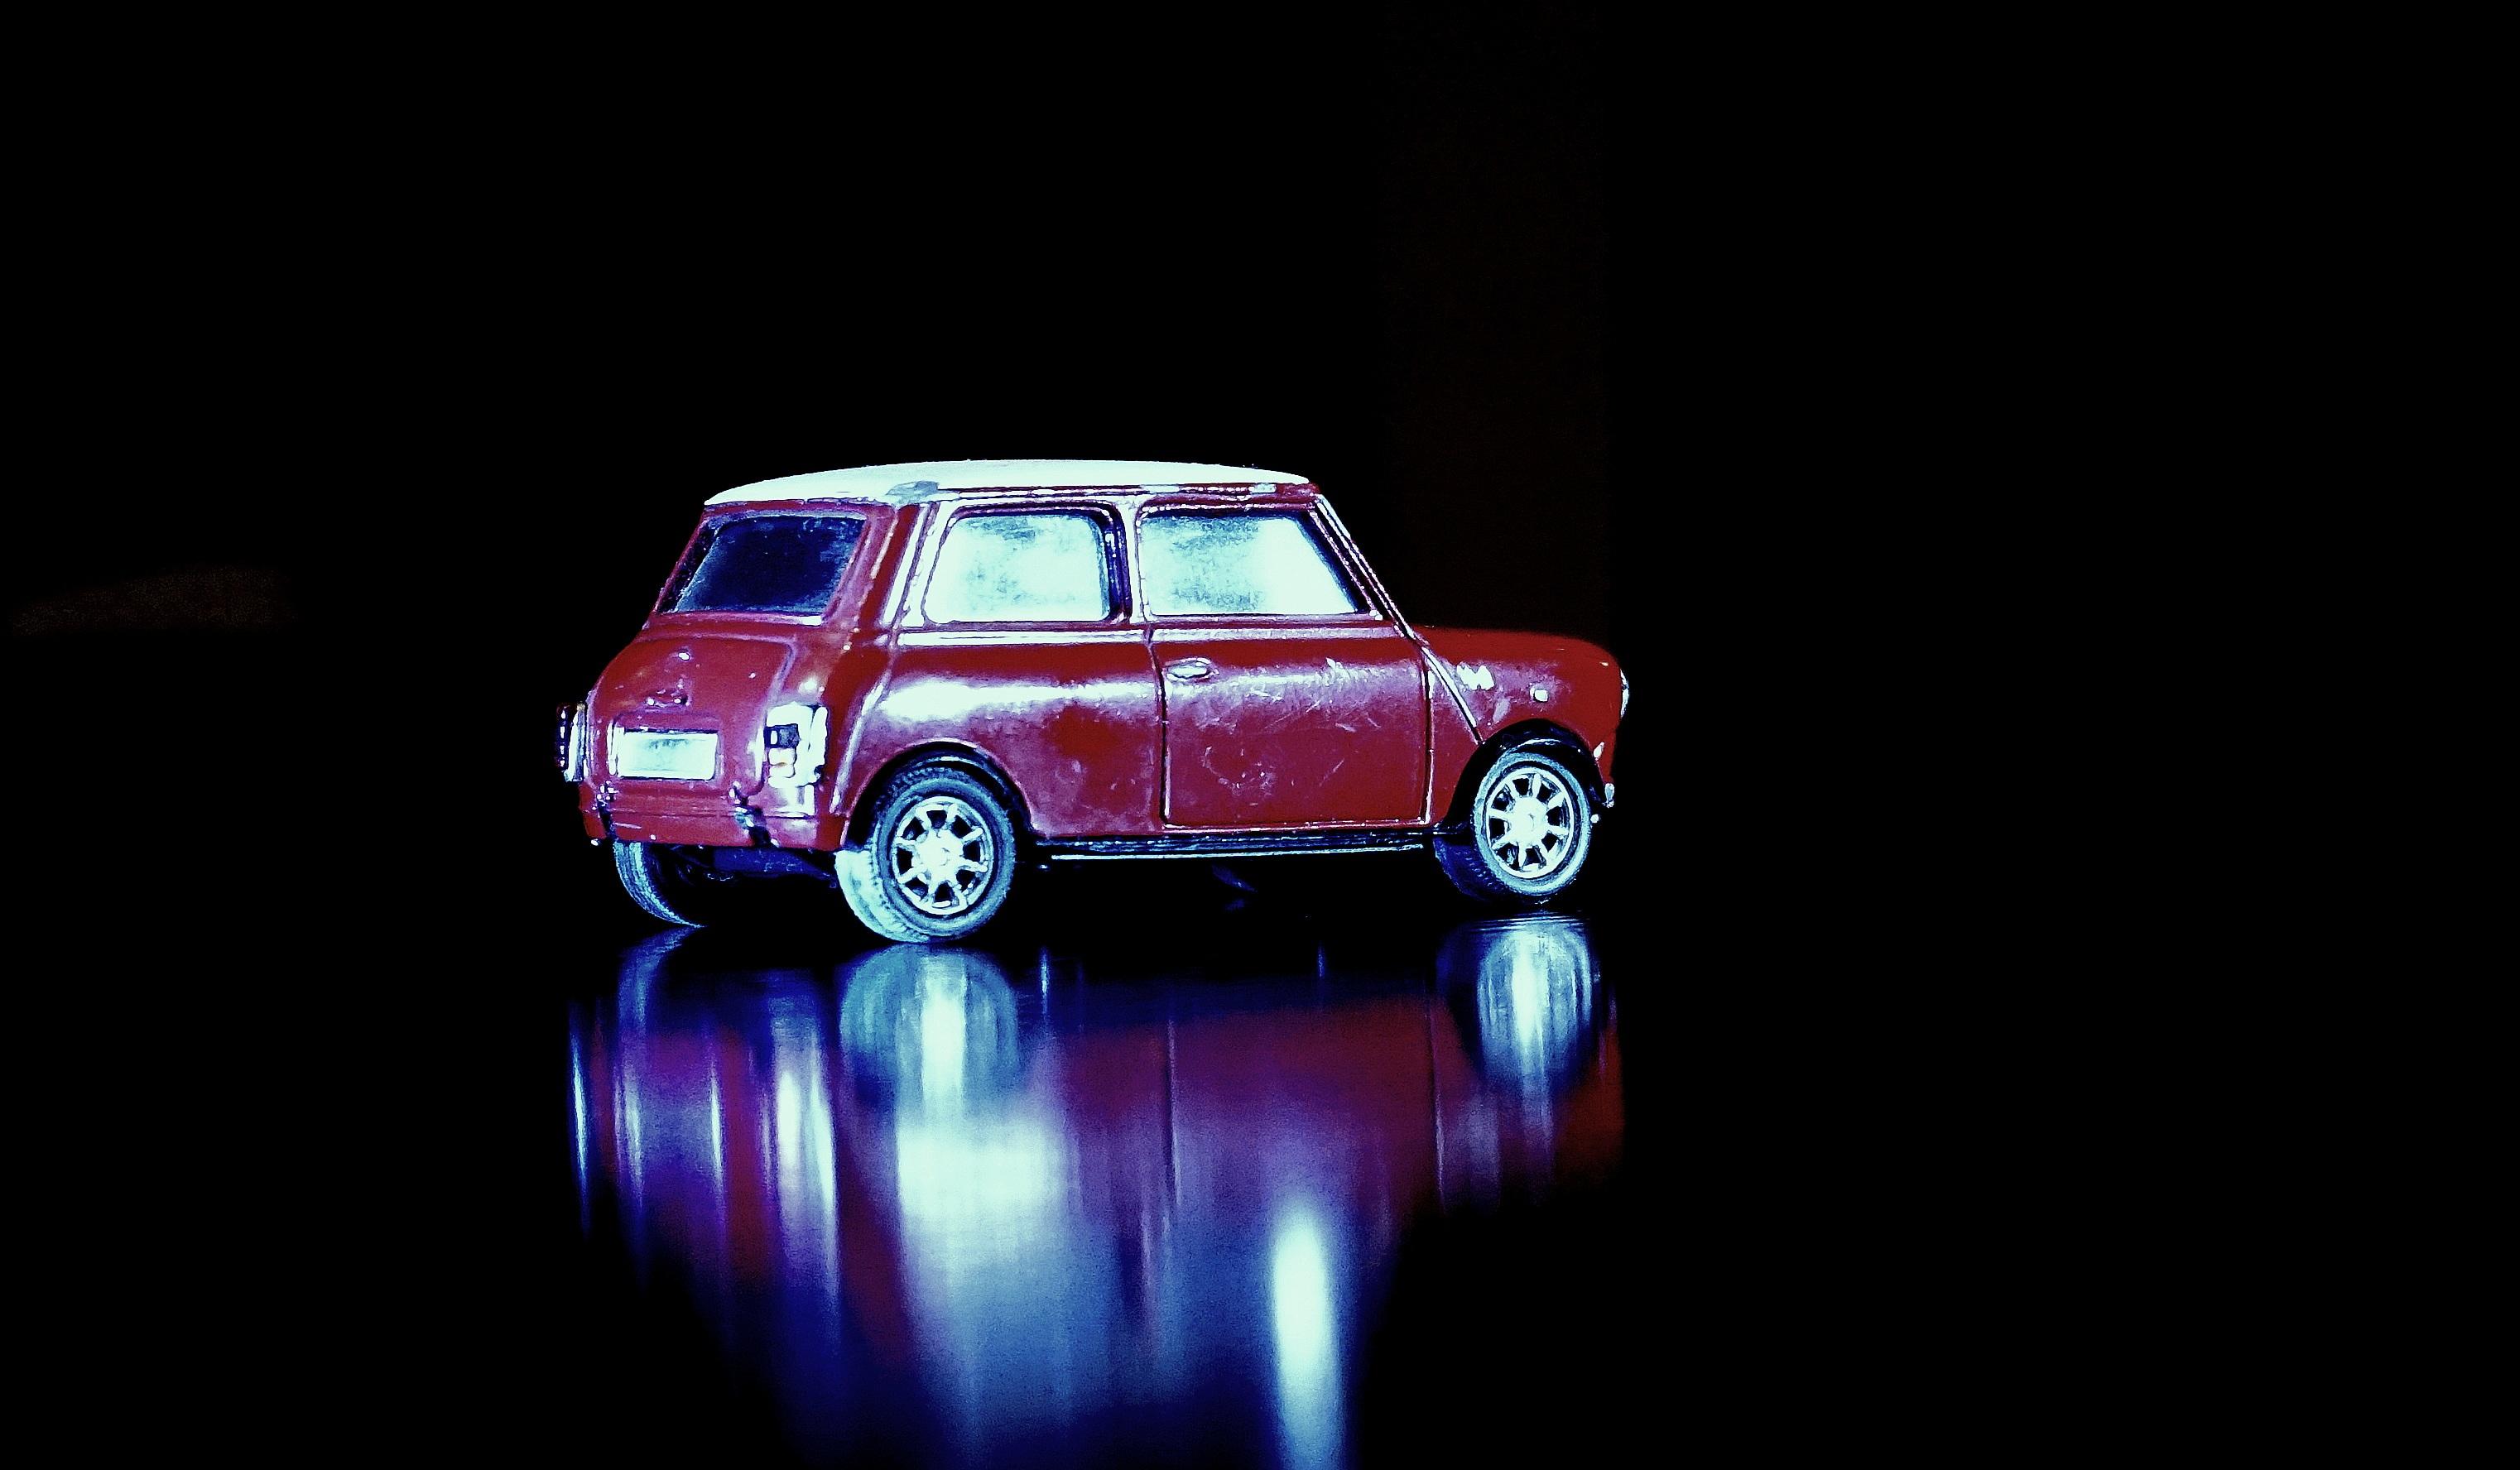 Kostenlose foto : Auto, Rad, rot, Fahrzeug, Rahmen, Spielzeug ...